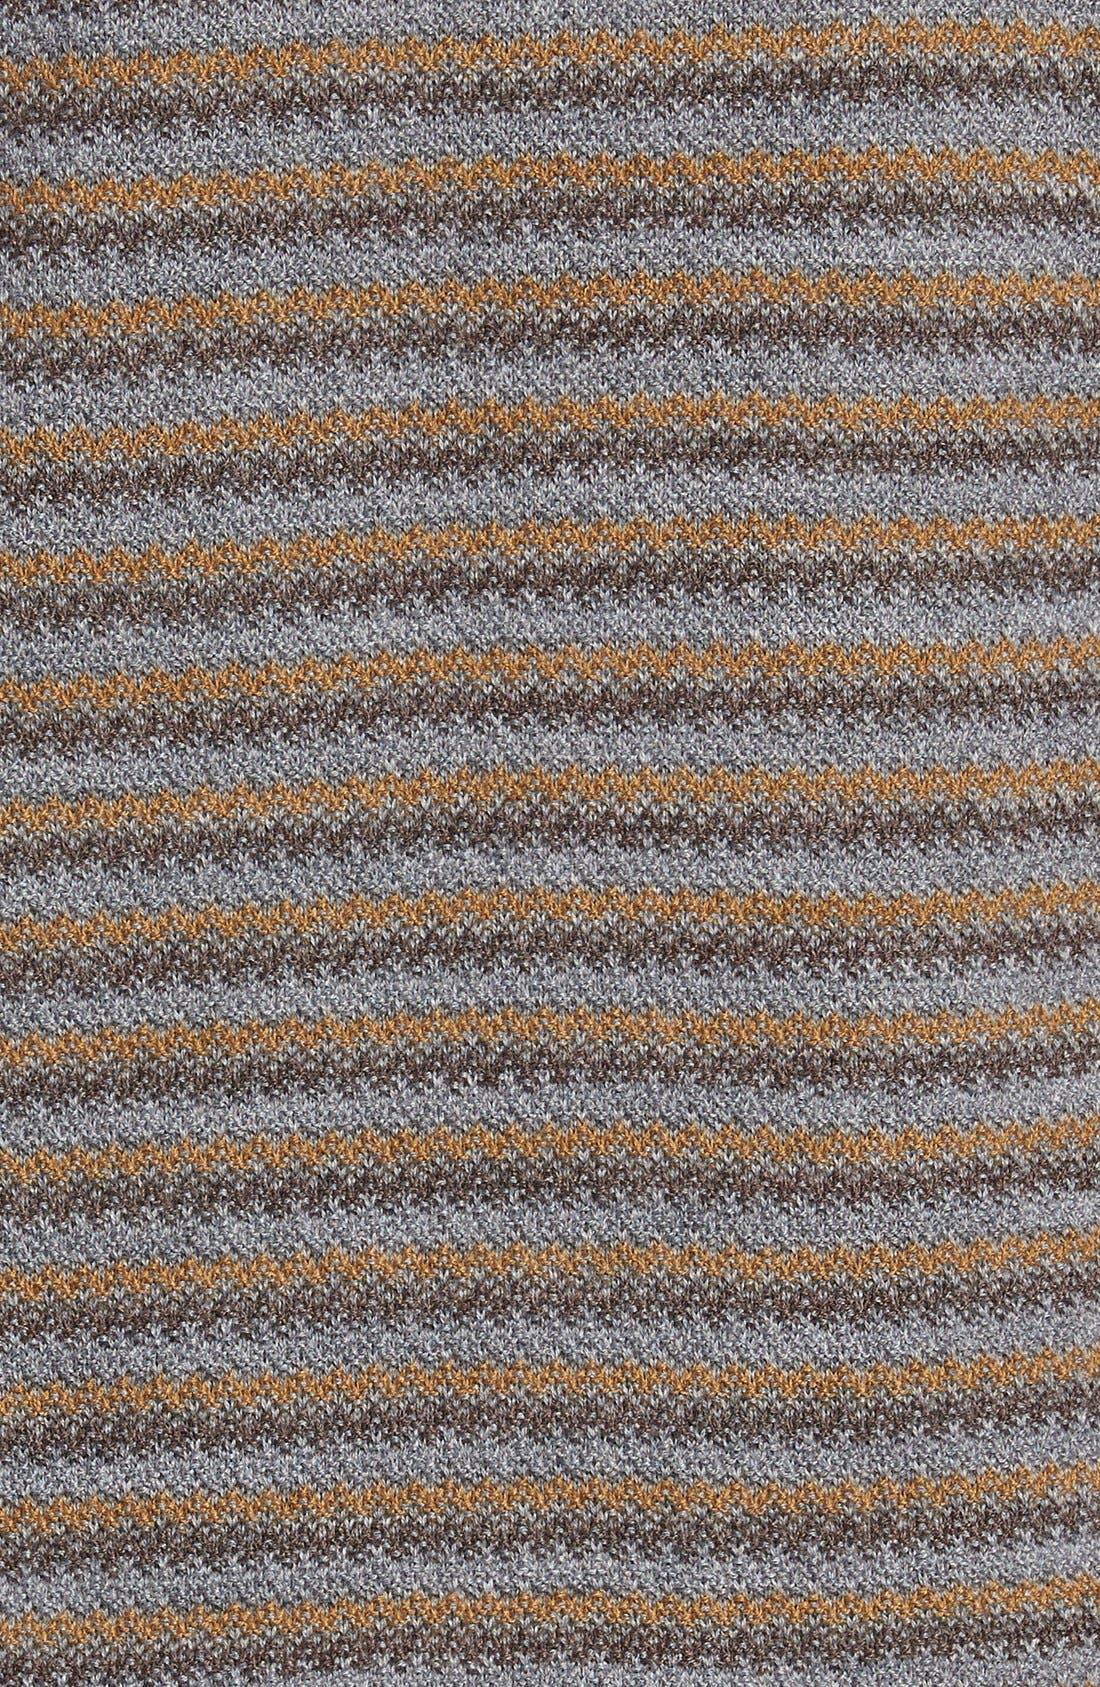 'Douglas Range' Quarter Zip Stripe Wool Blend Sweater,                             Alternate thumbnail 2, color,                             200